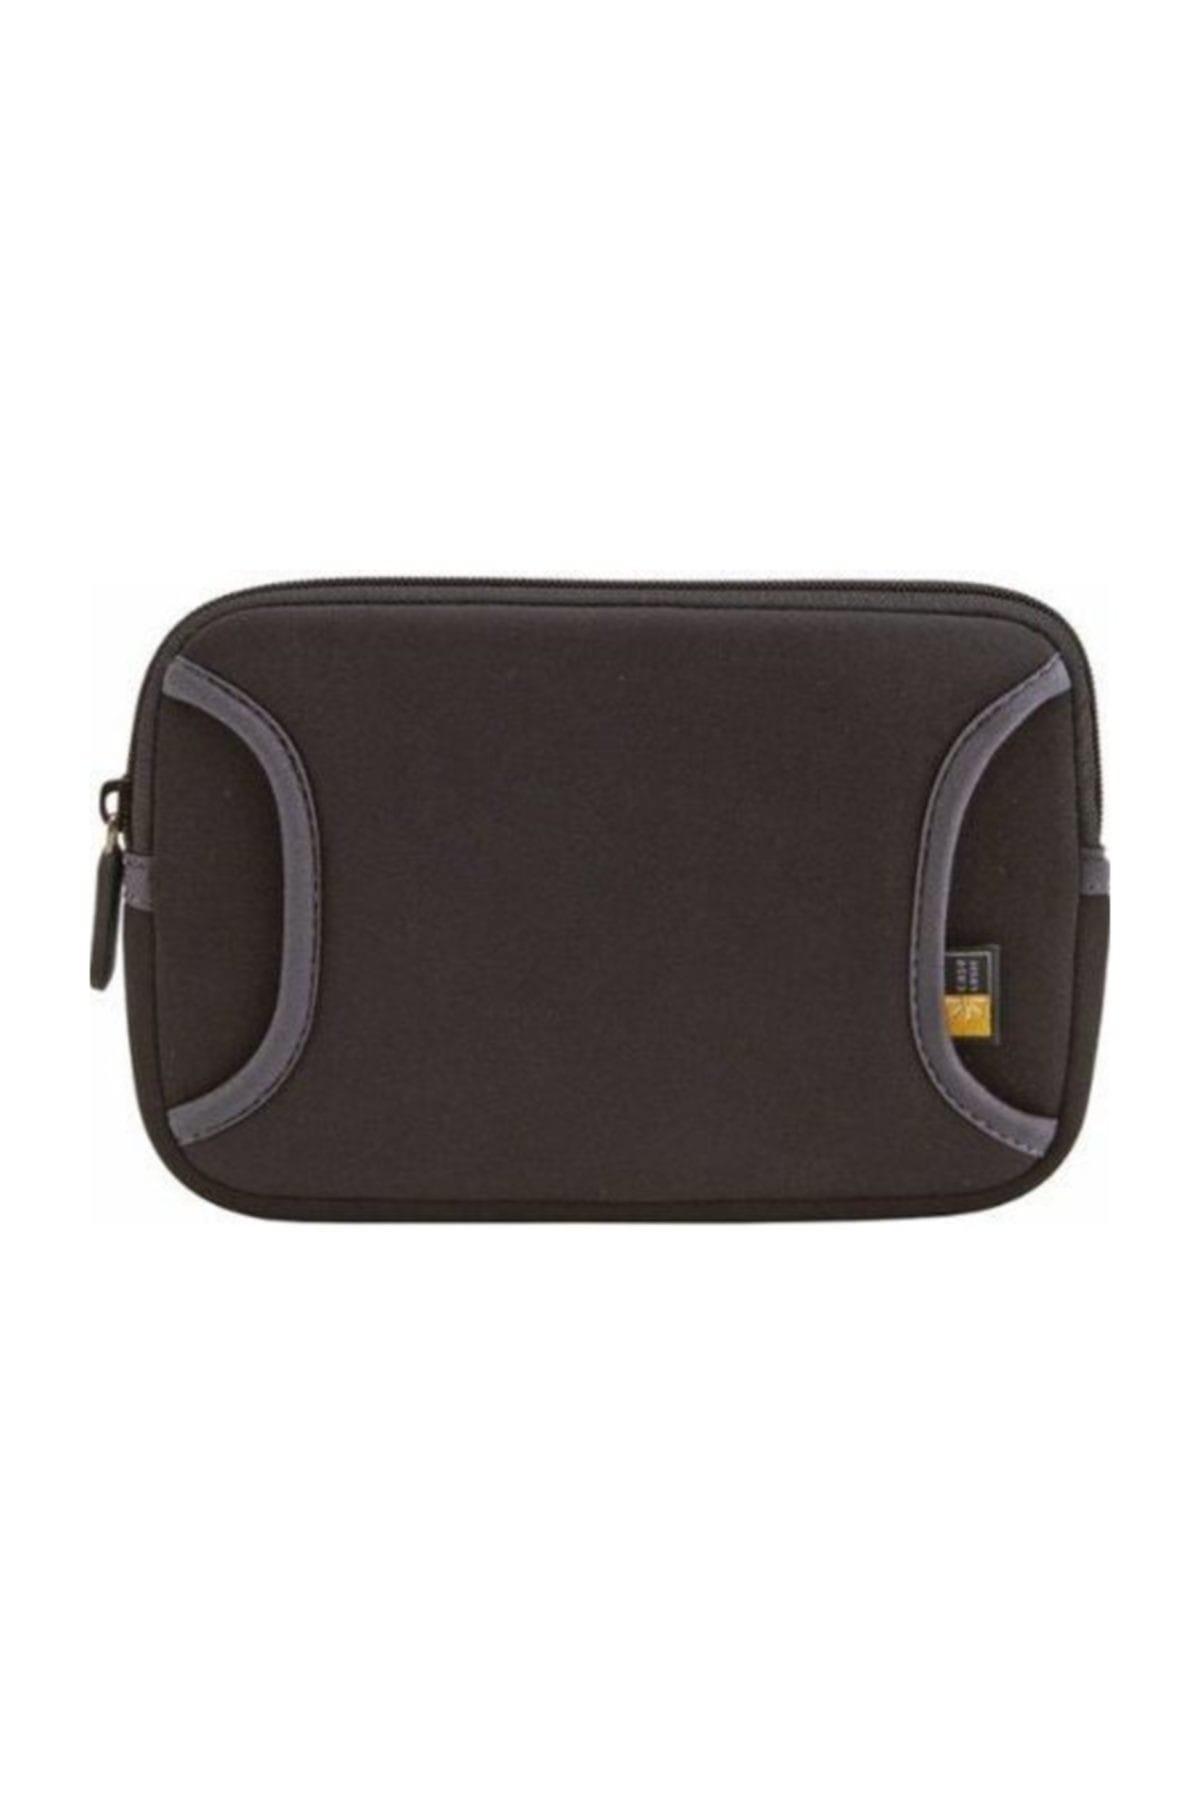 CaseLogic LNE07 7-Inch Siyah Tablet Kılıf 1